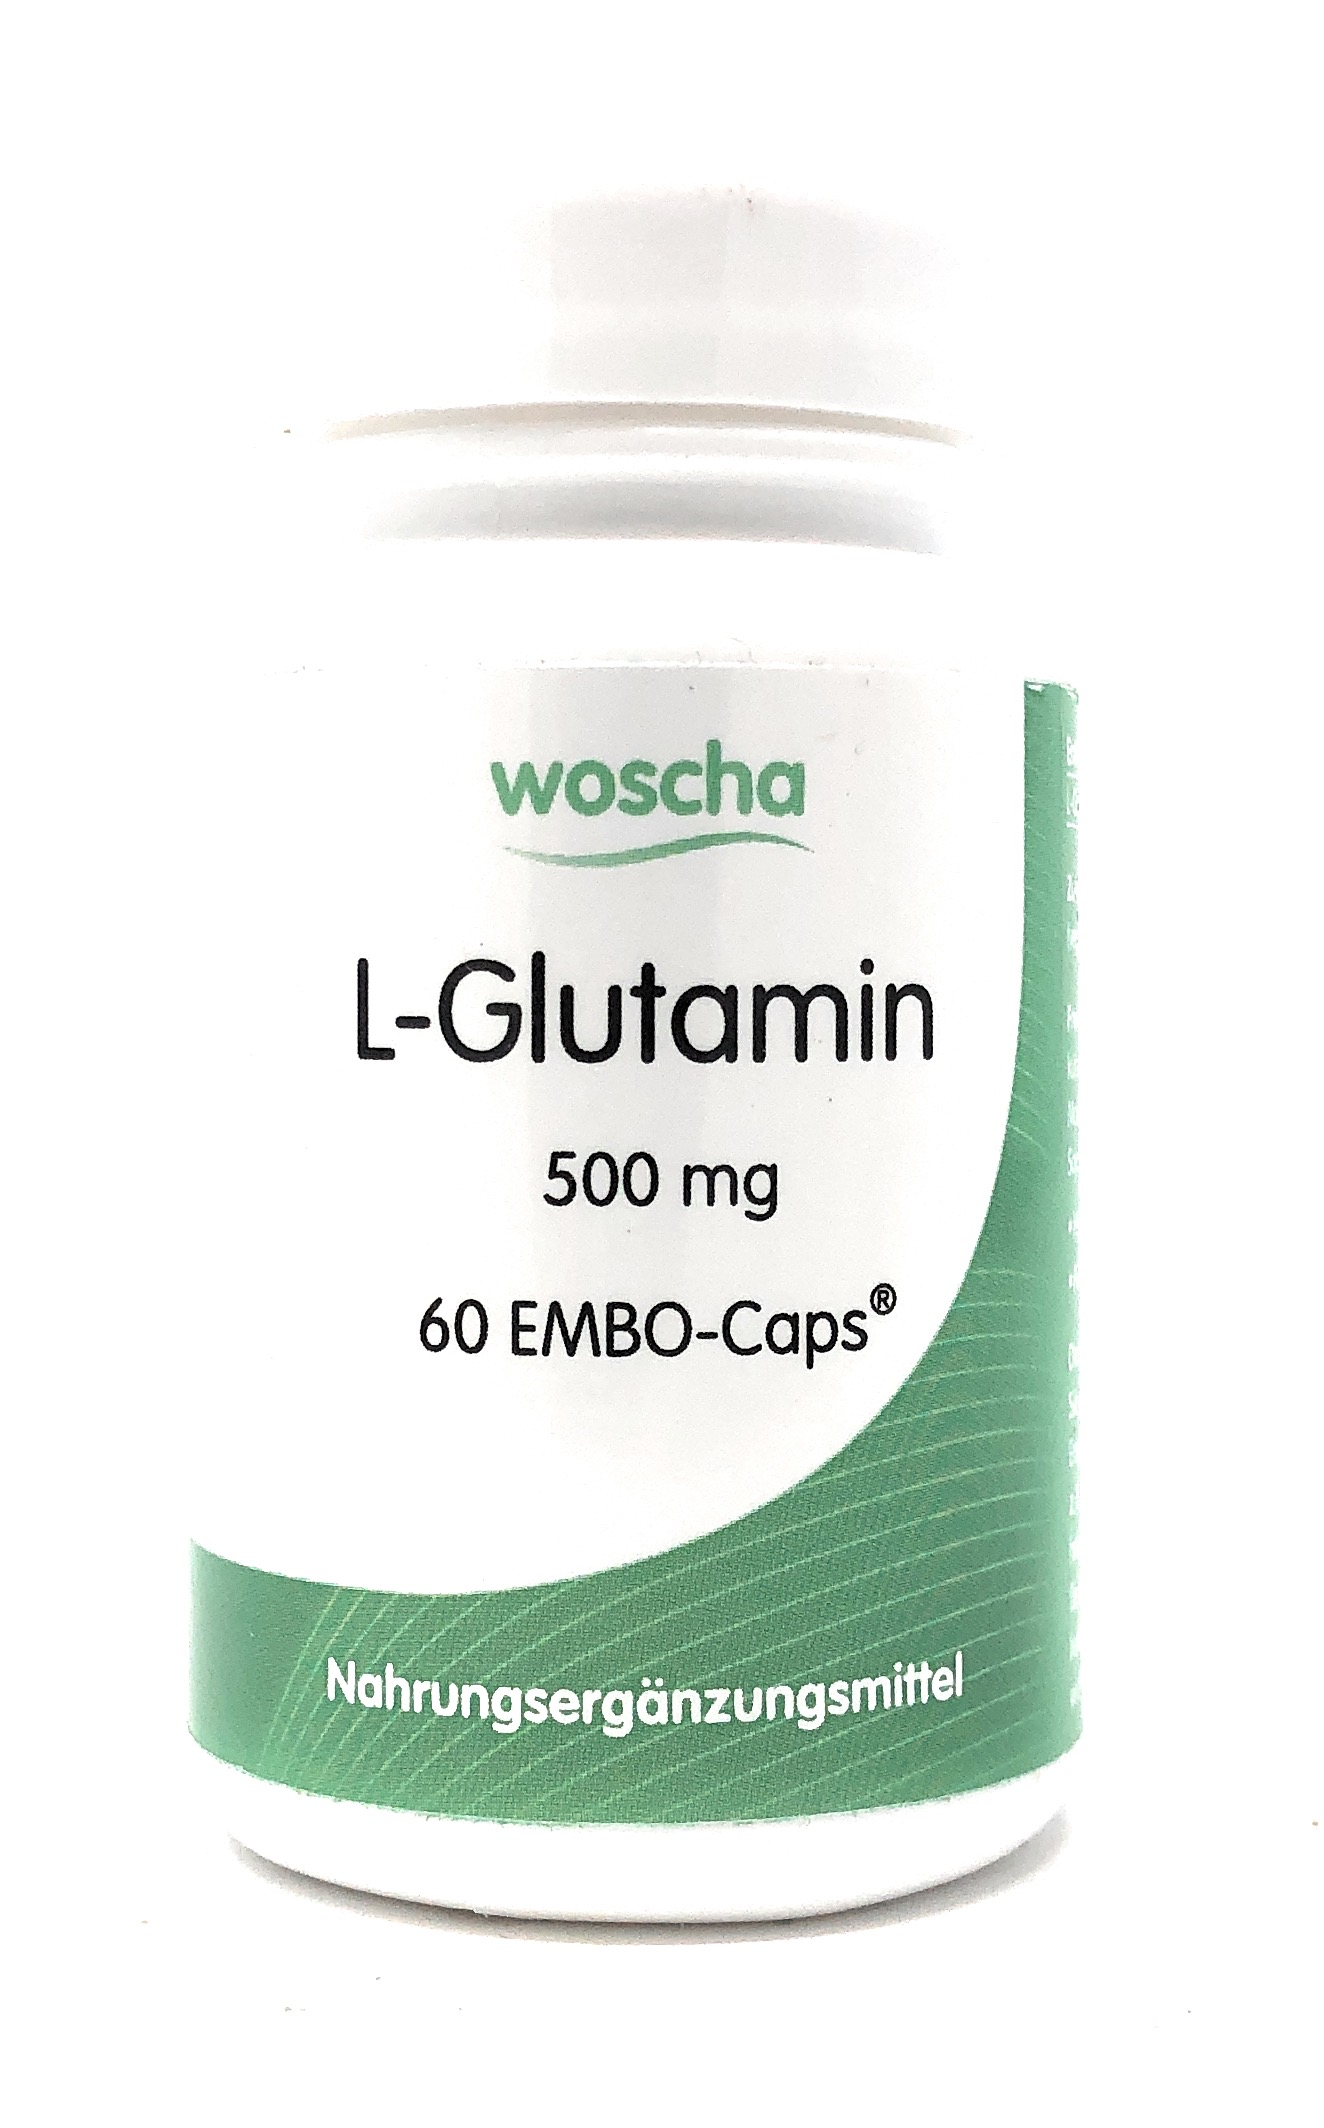 woscha L-Glutamin 500mg 60 Embo-CAPS® (35g) (vegan)